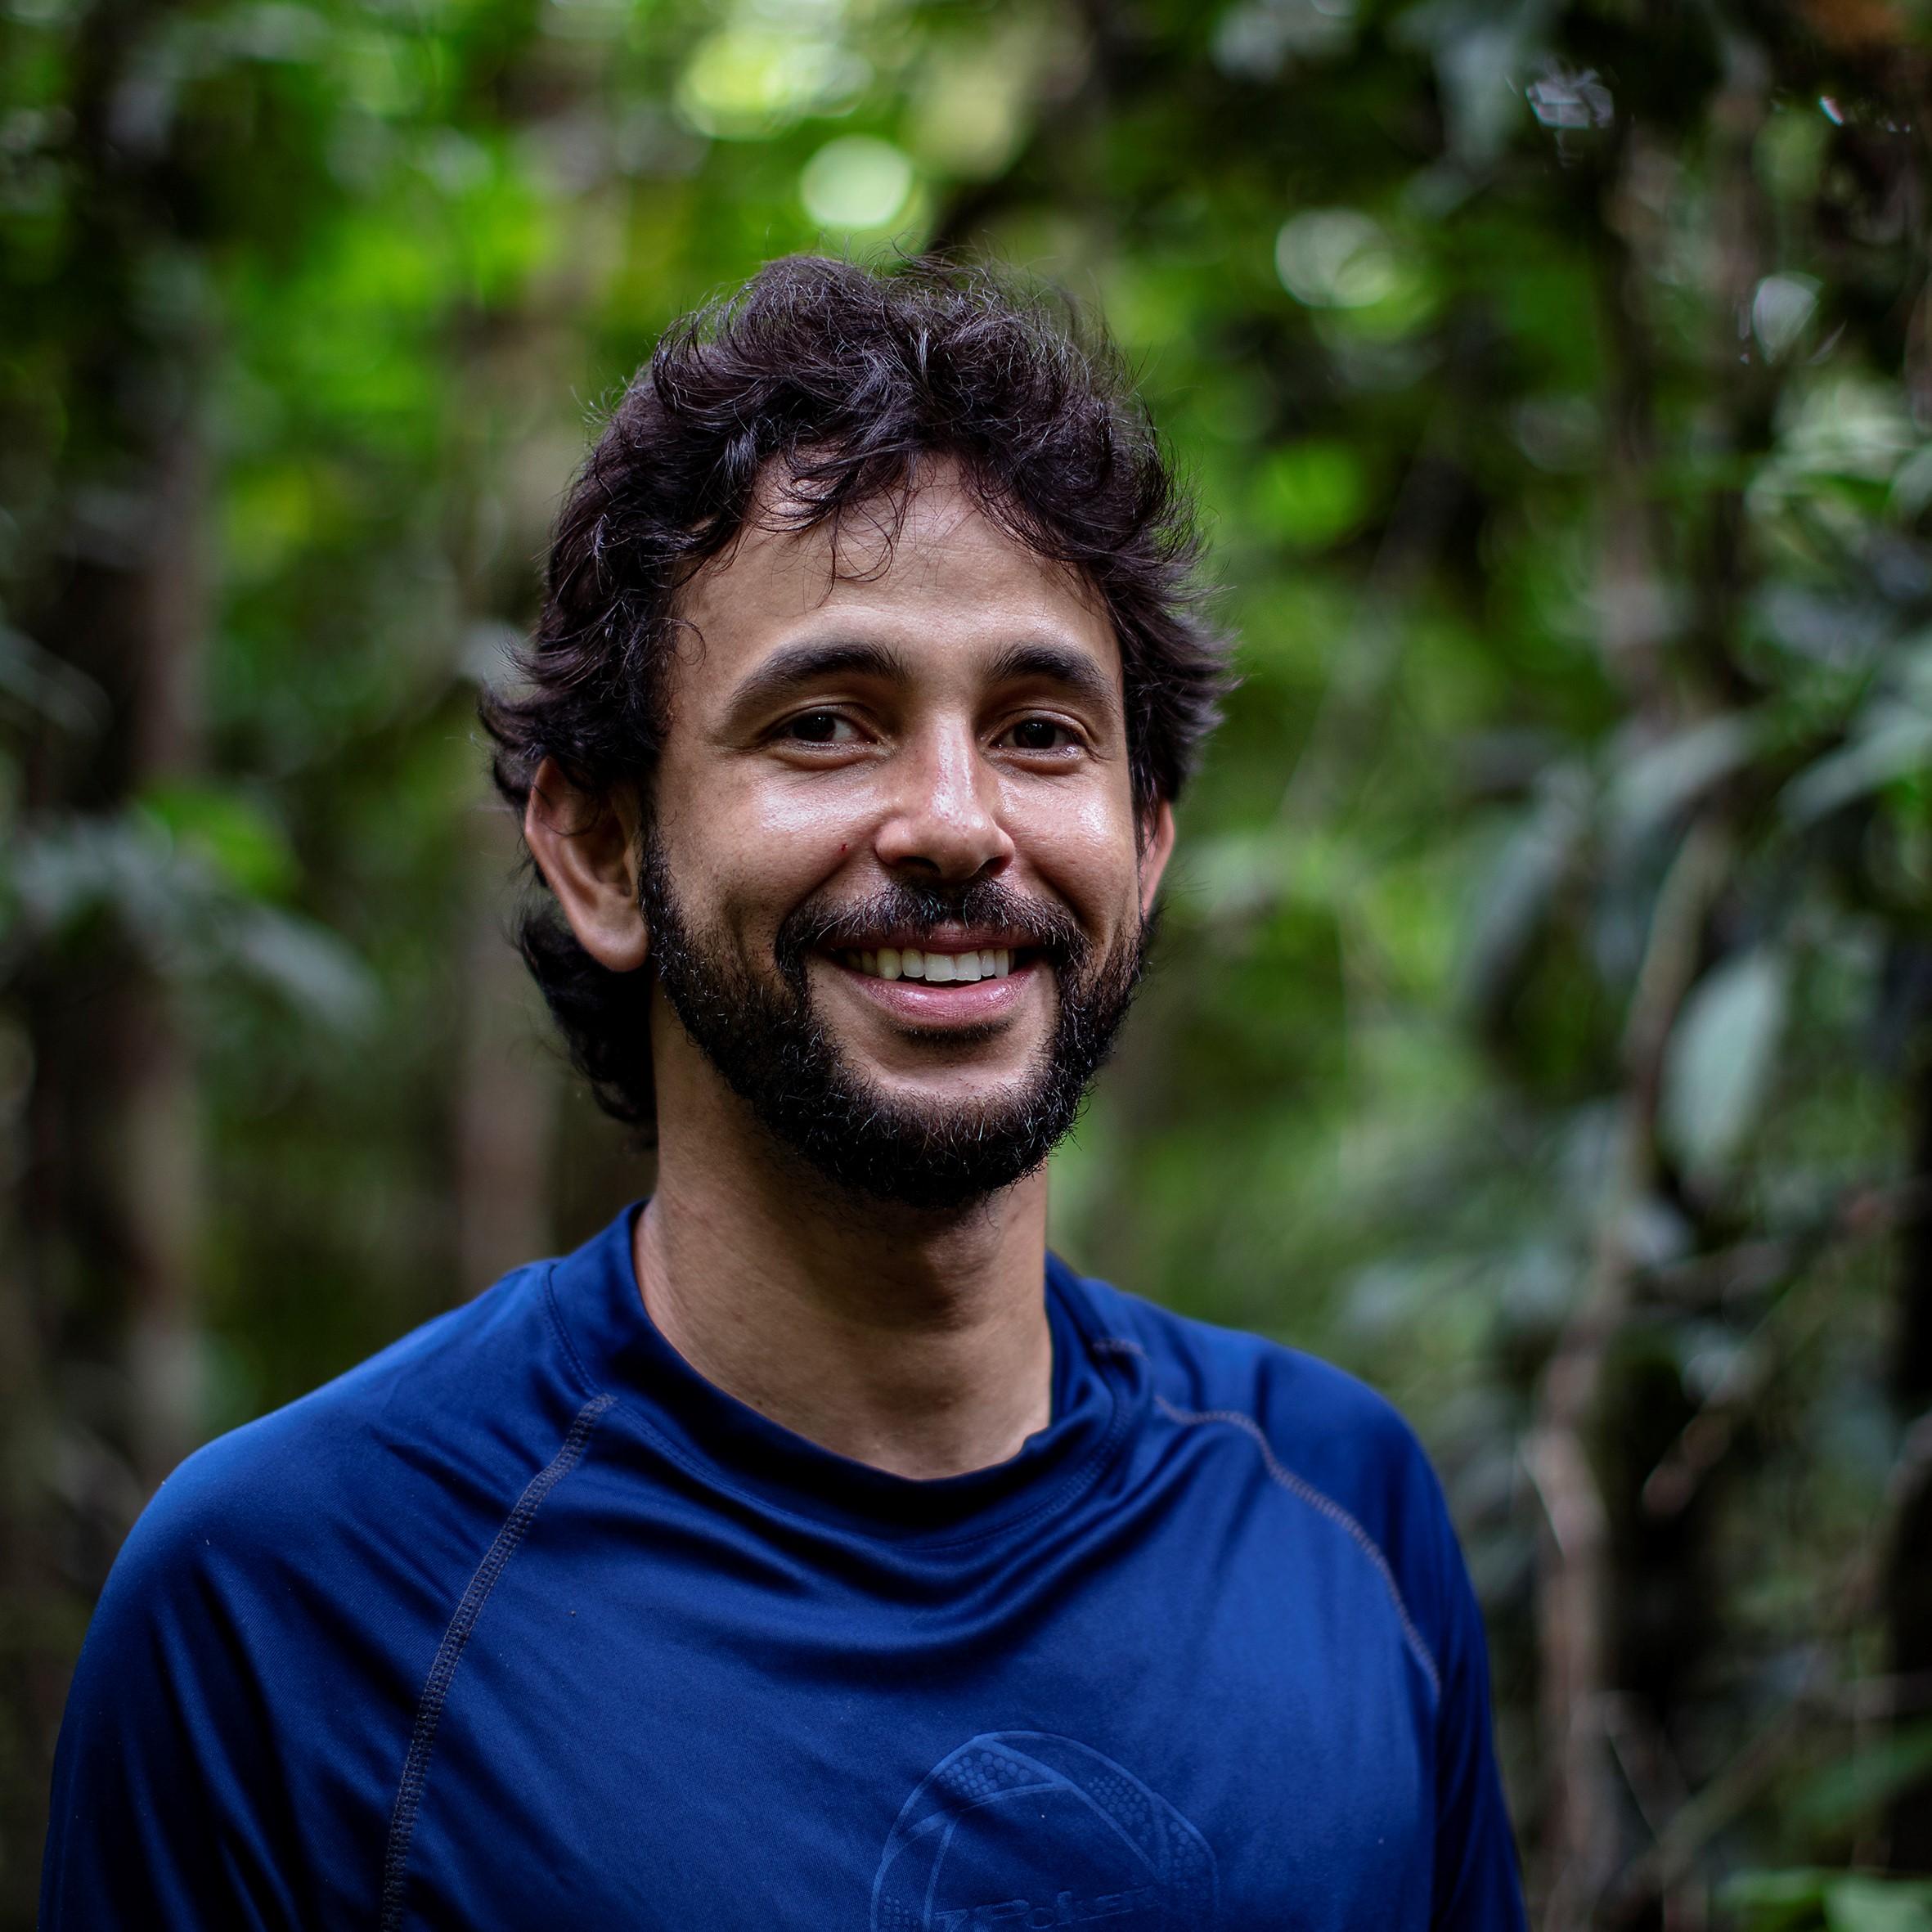 Filipe Machado Franca